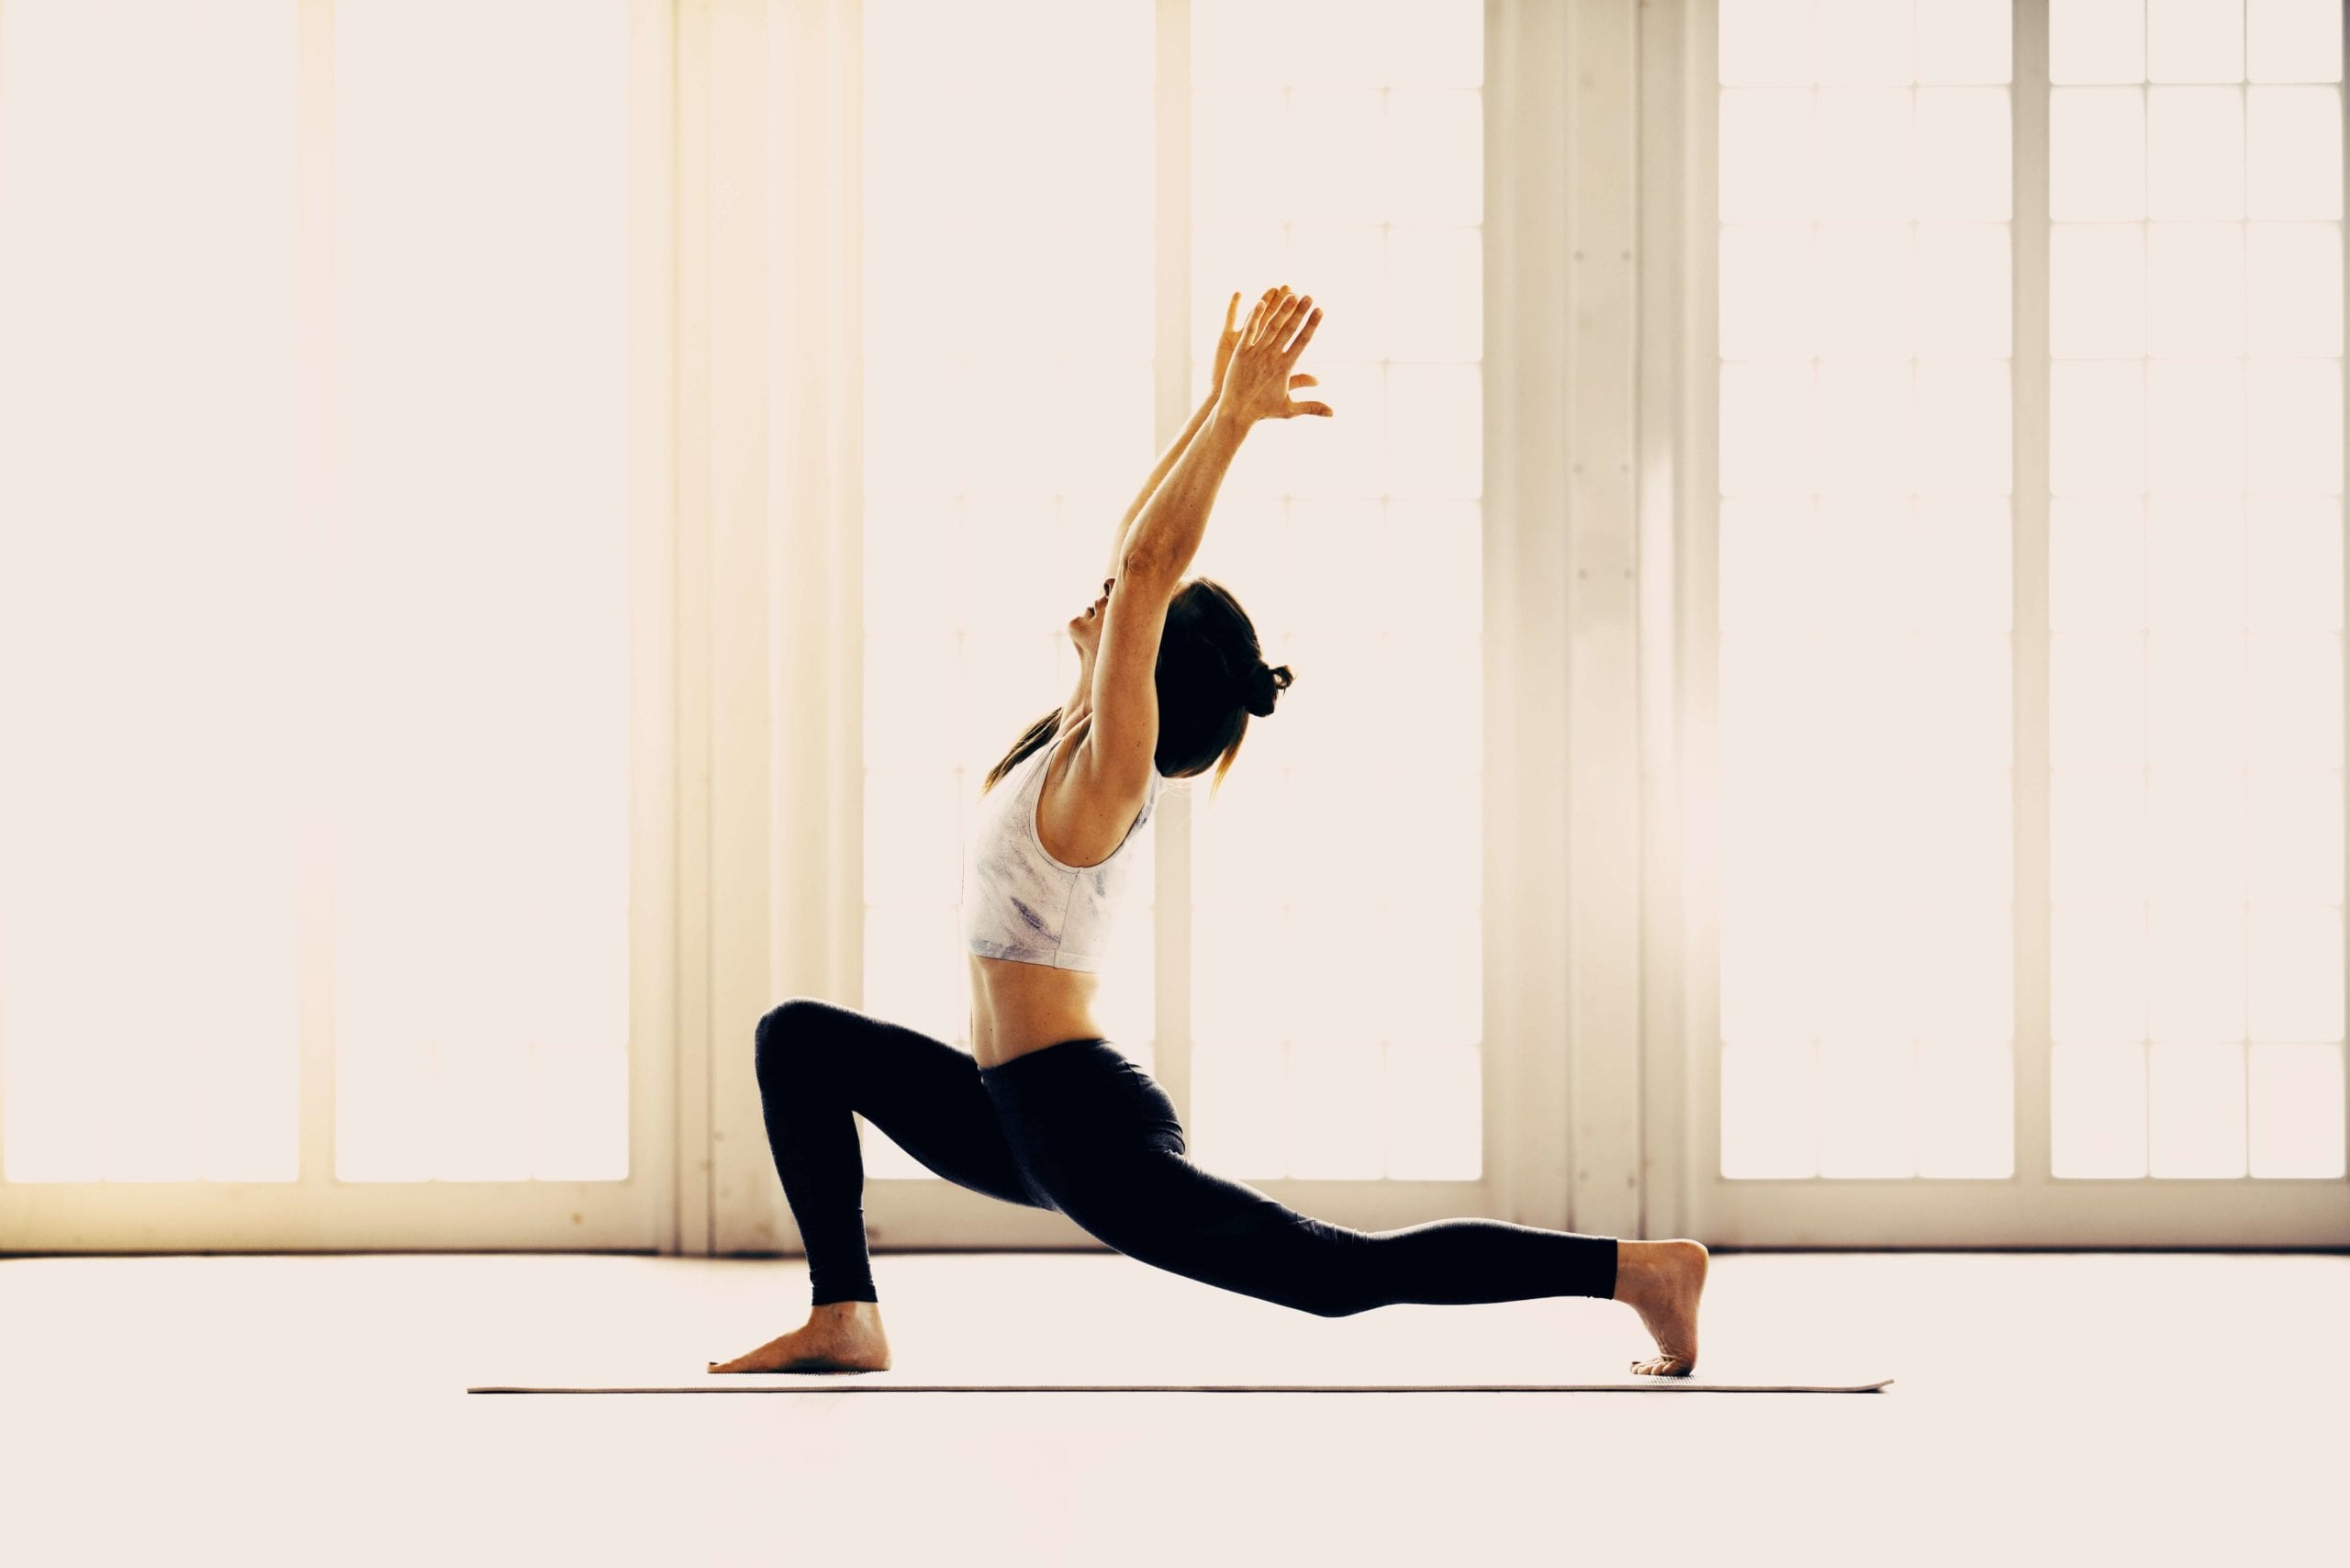 Meike Spitko Yoga Krieger